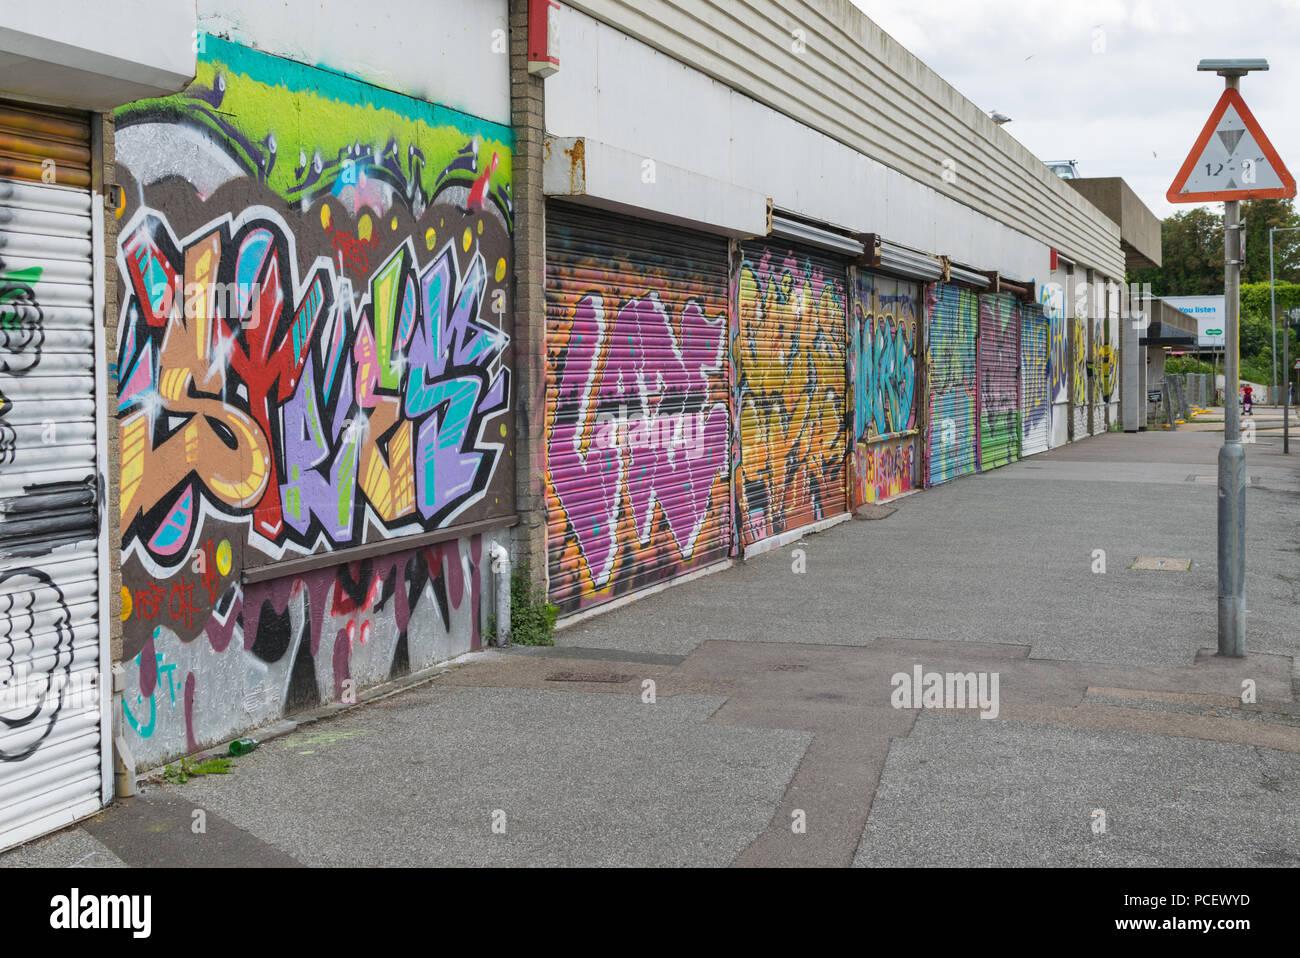 Abandoned Shops With Graffiti On Them All Saints Avenue Margate Kent